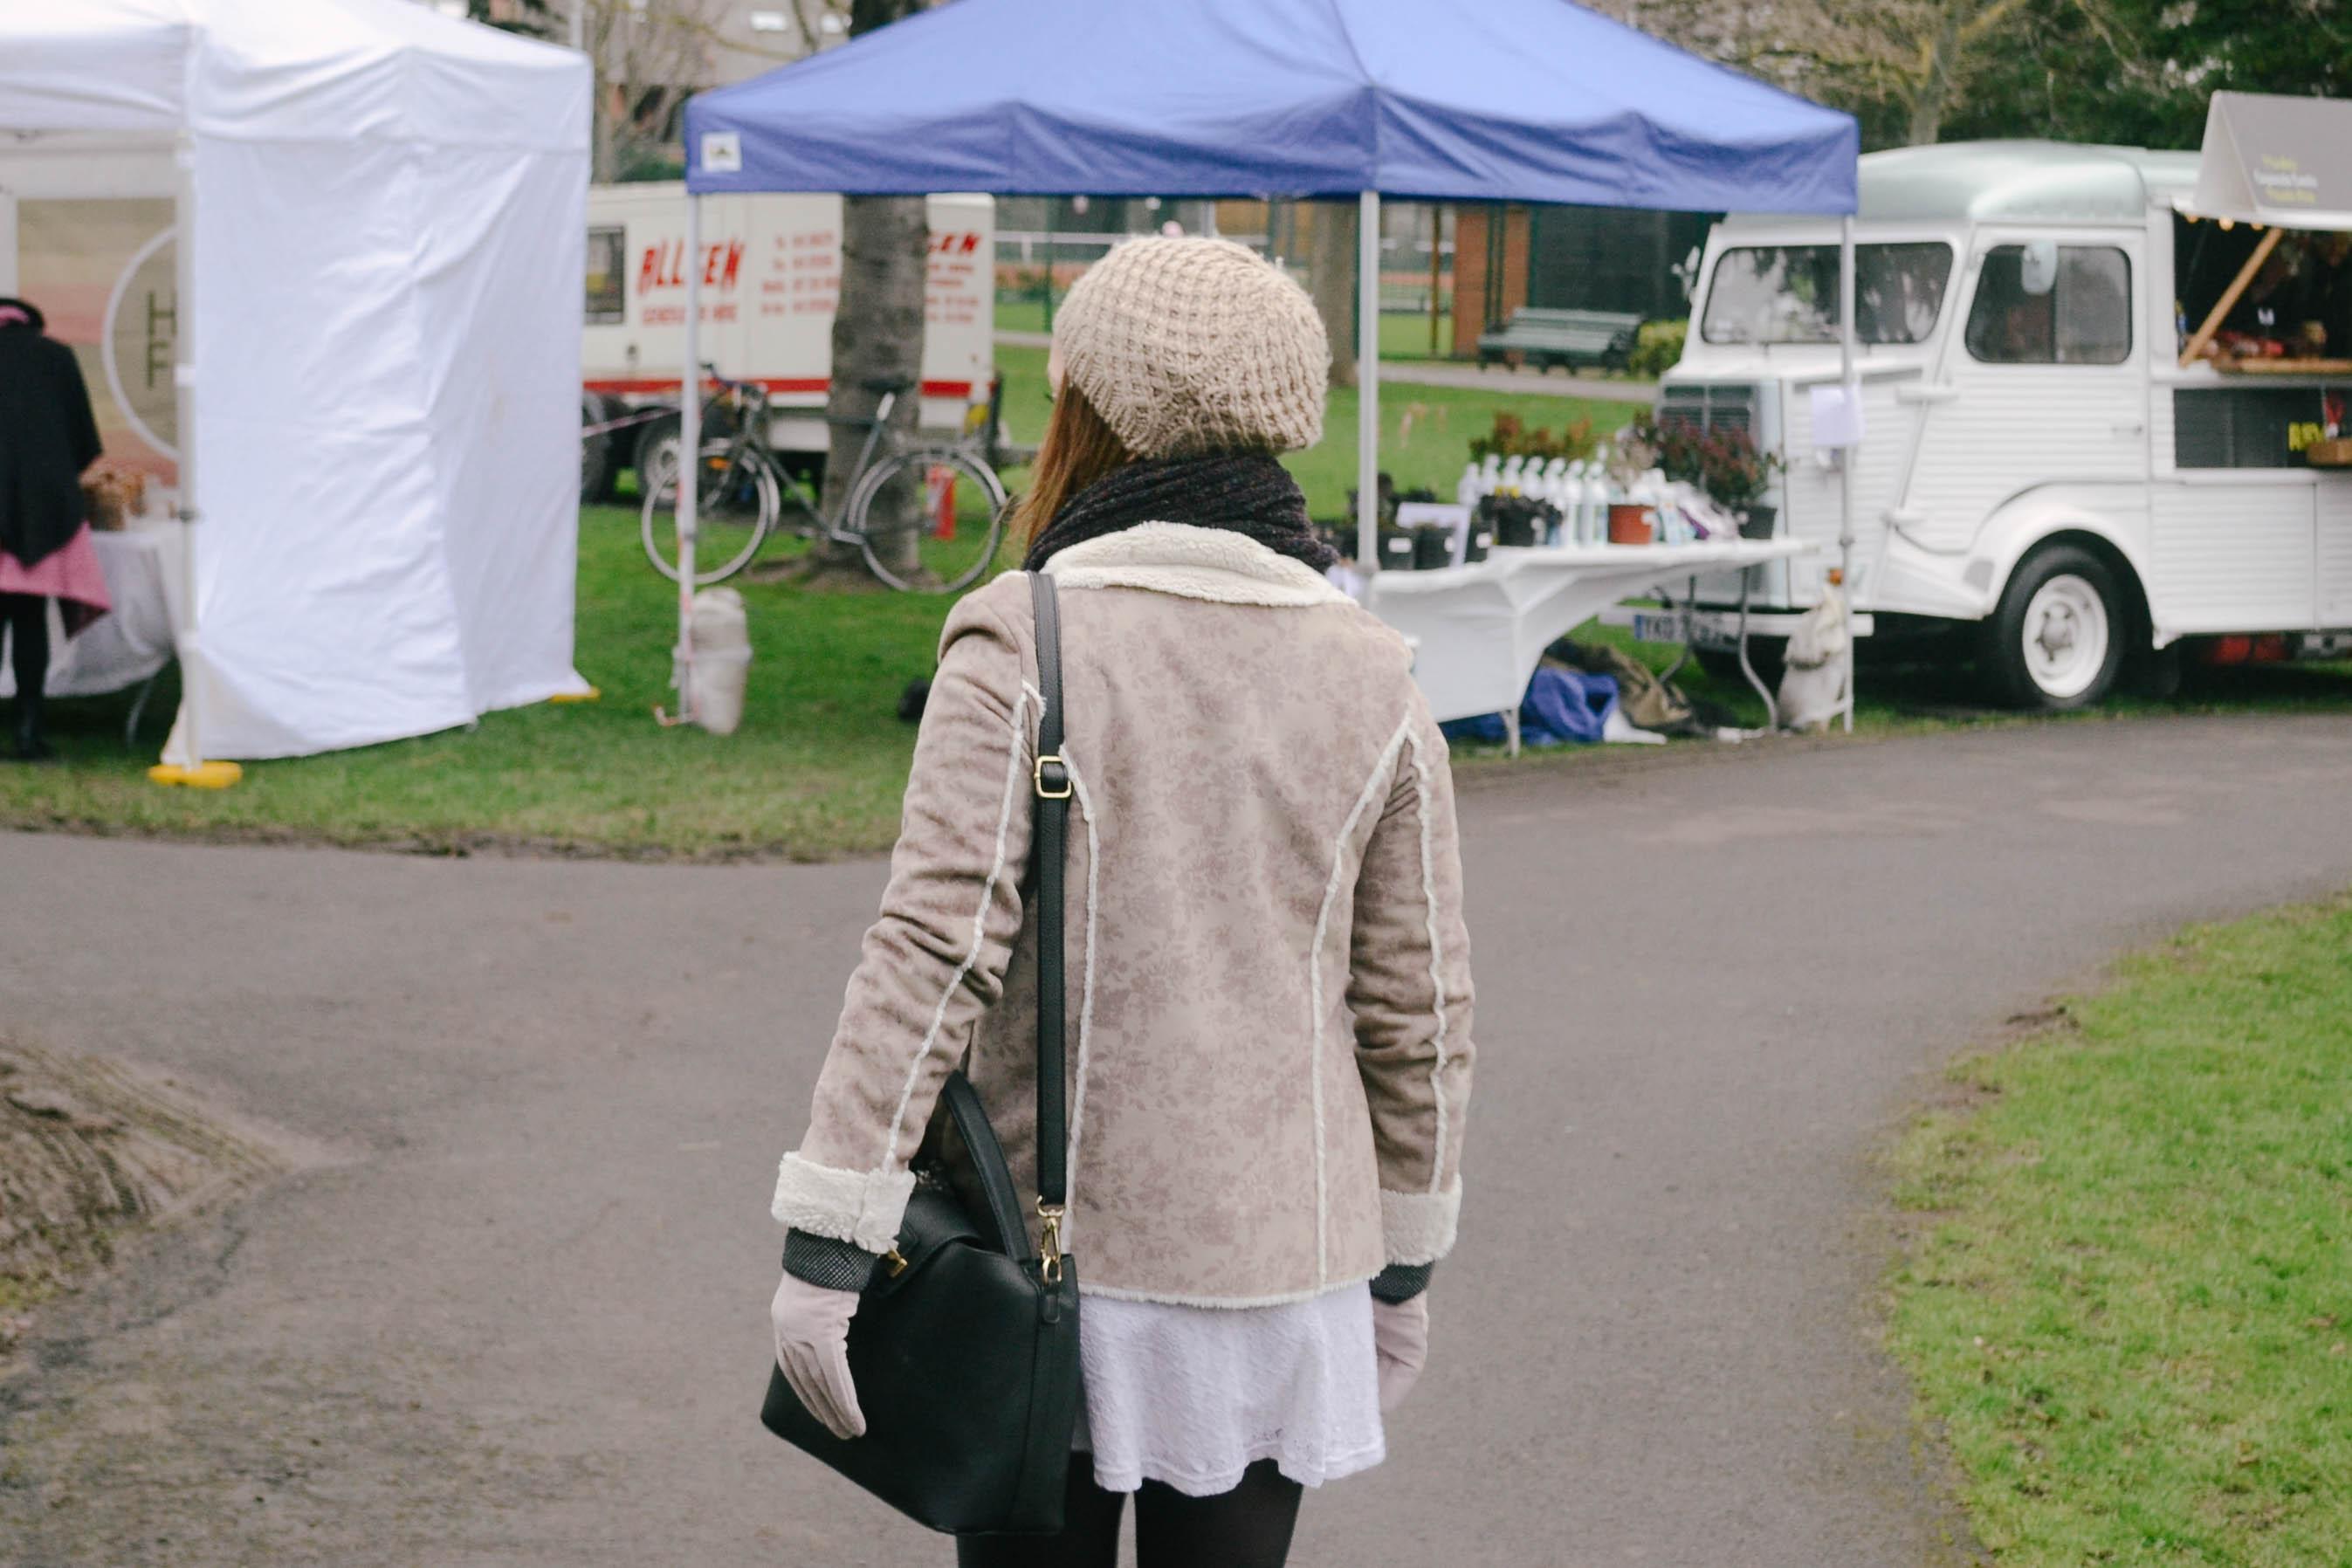 feira-comida-market-herbert-park-ballsbridge-passeio-domingo-sunday-food-park-dublin-ireland-irlanda-dicas_-8